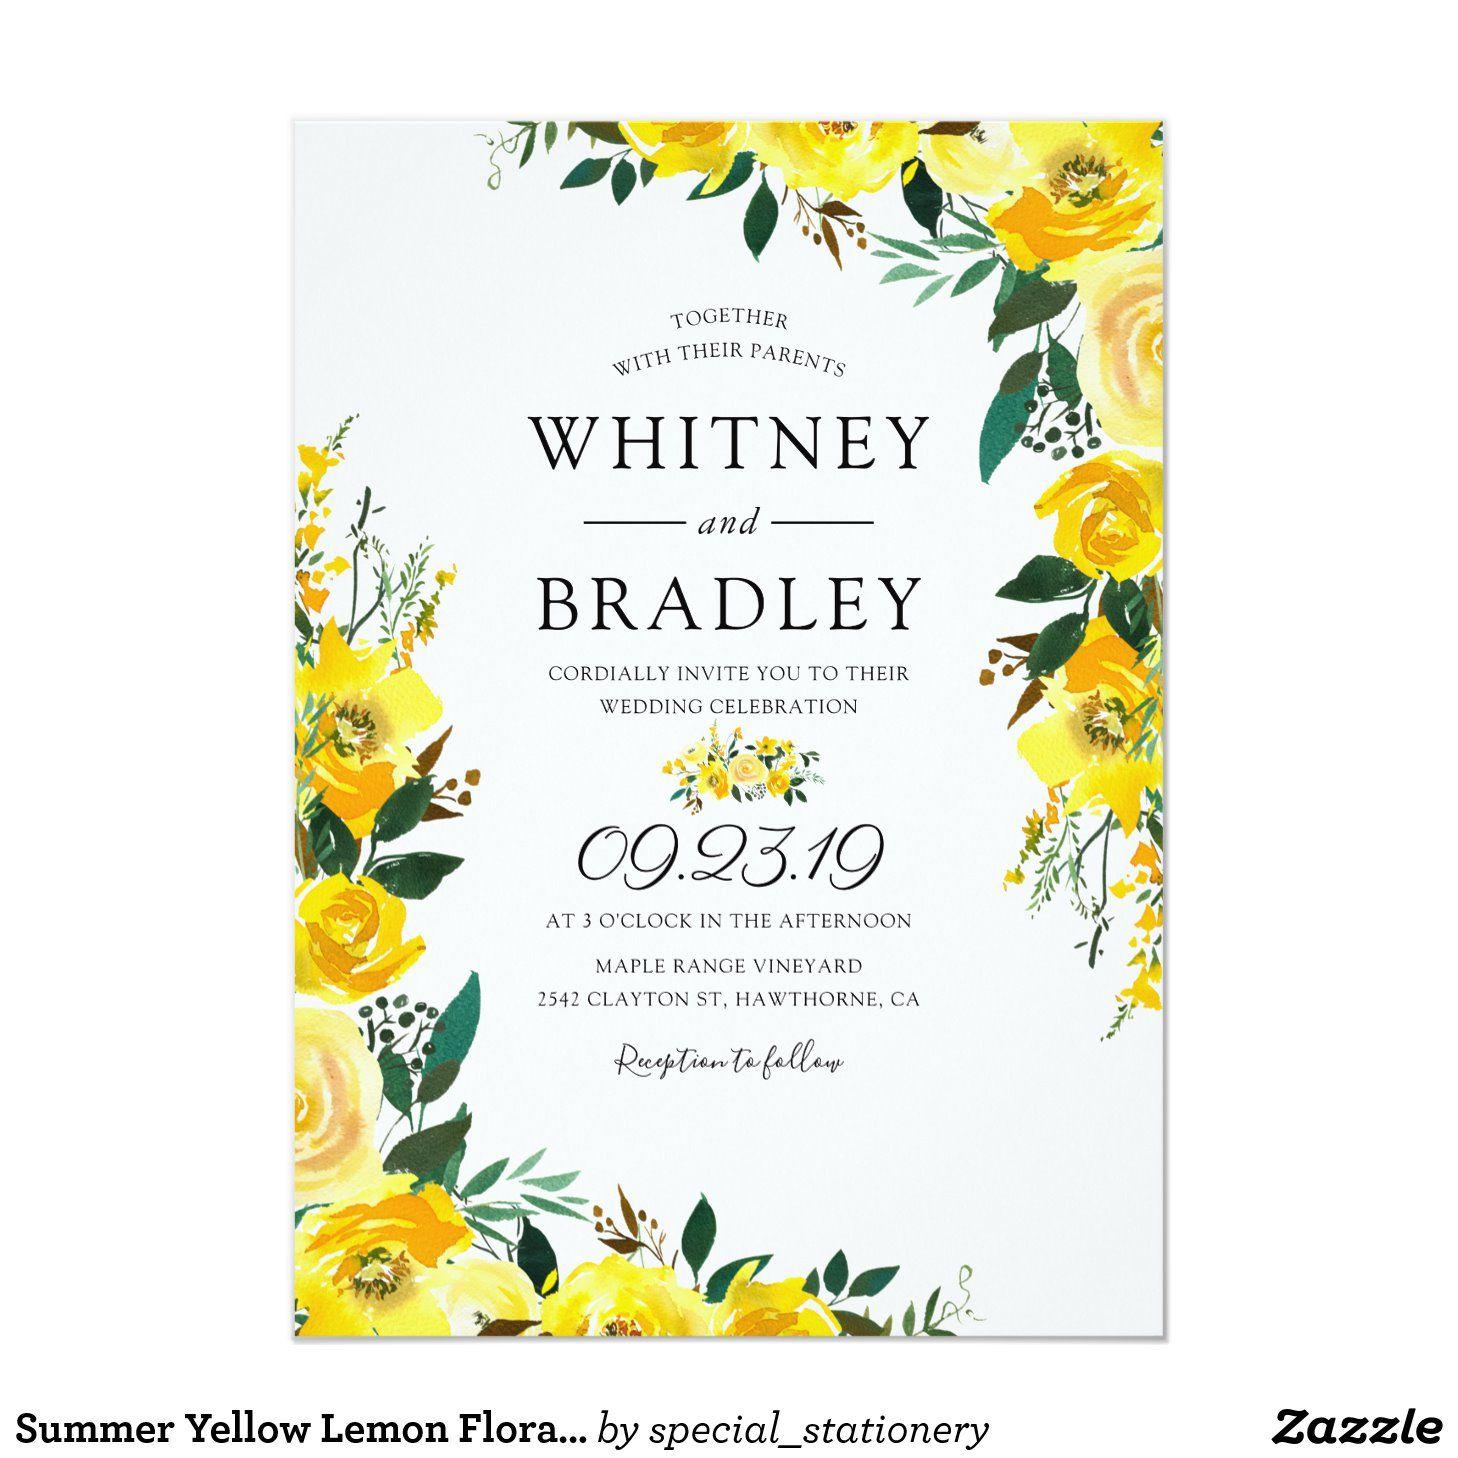 Summer Yellow Lemon Floral Wedding Invitation Zazzle Com Floral Wedding Invitations Floral Wedding Wildflower Wedding Invitations